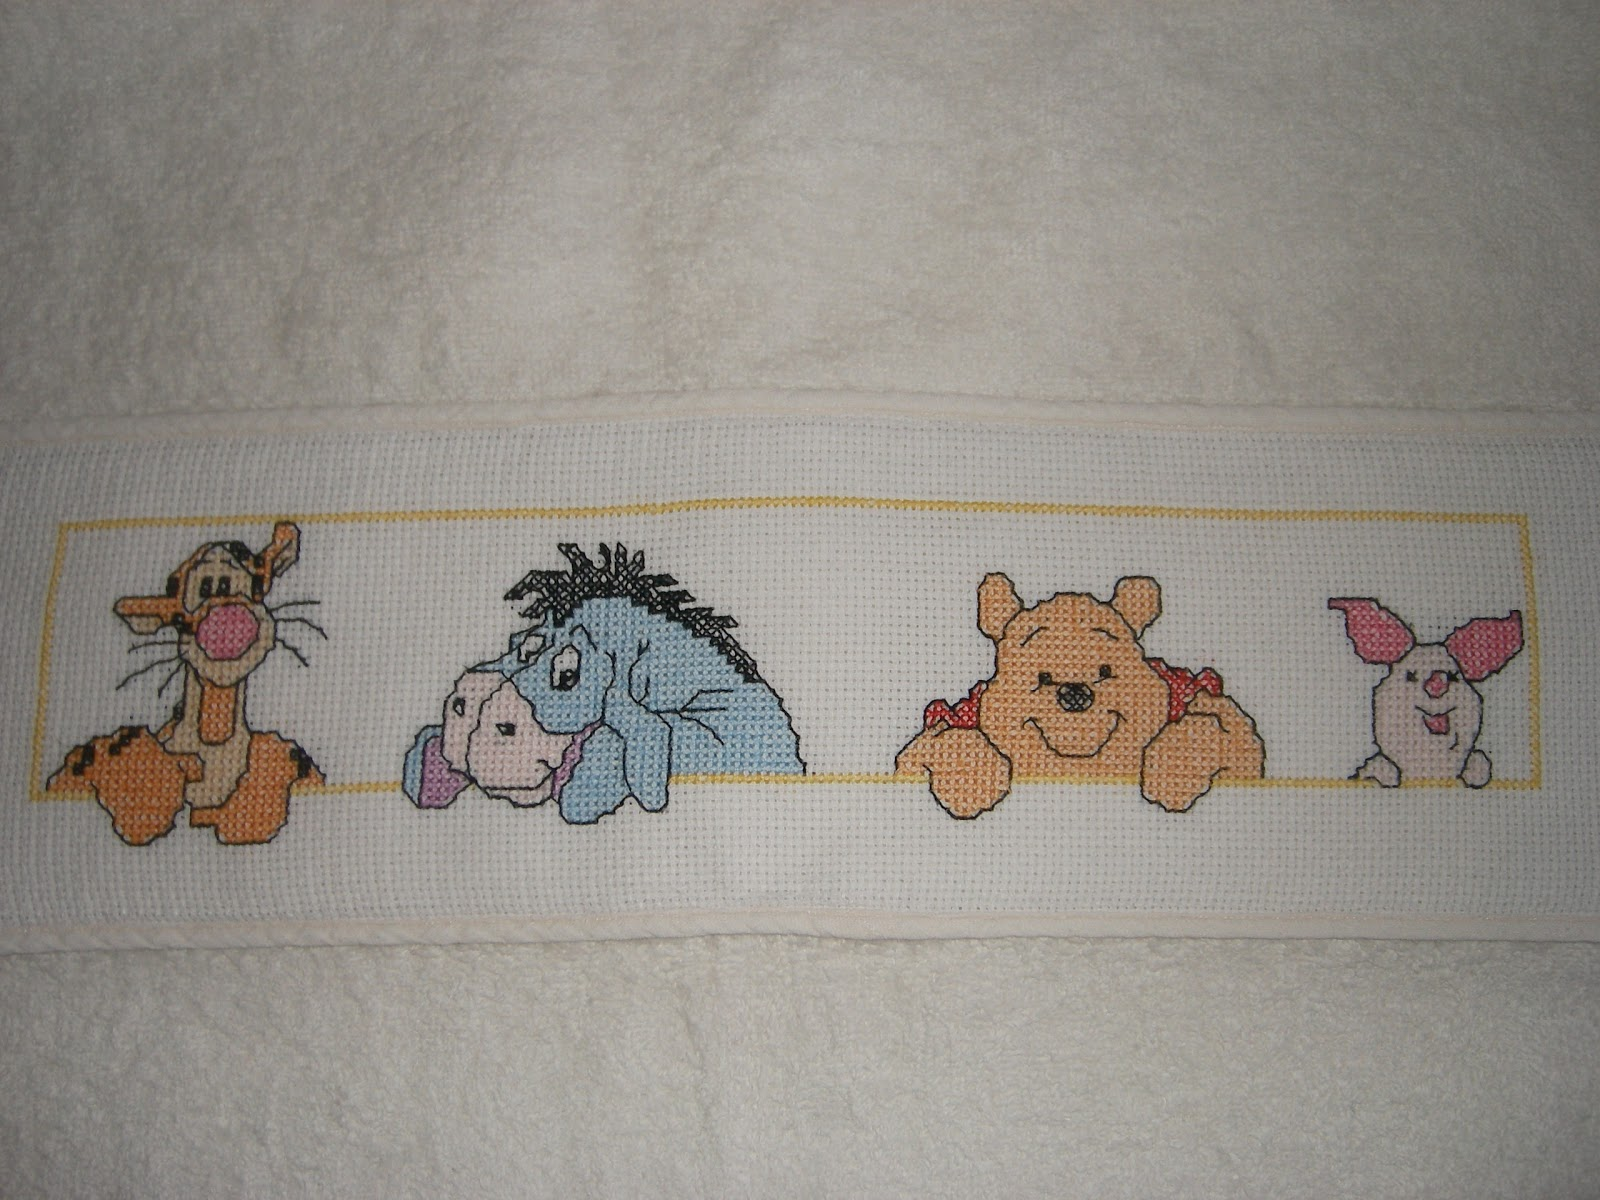 Punto croce lavori a punto croce melita 2 for Winnie the pooh punto croce schemi